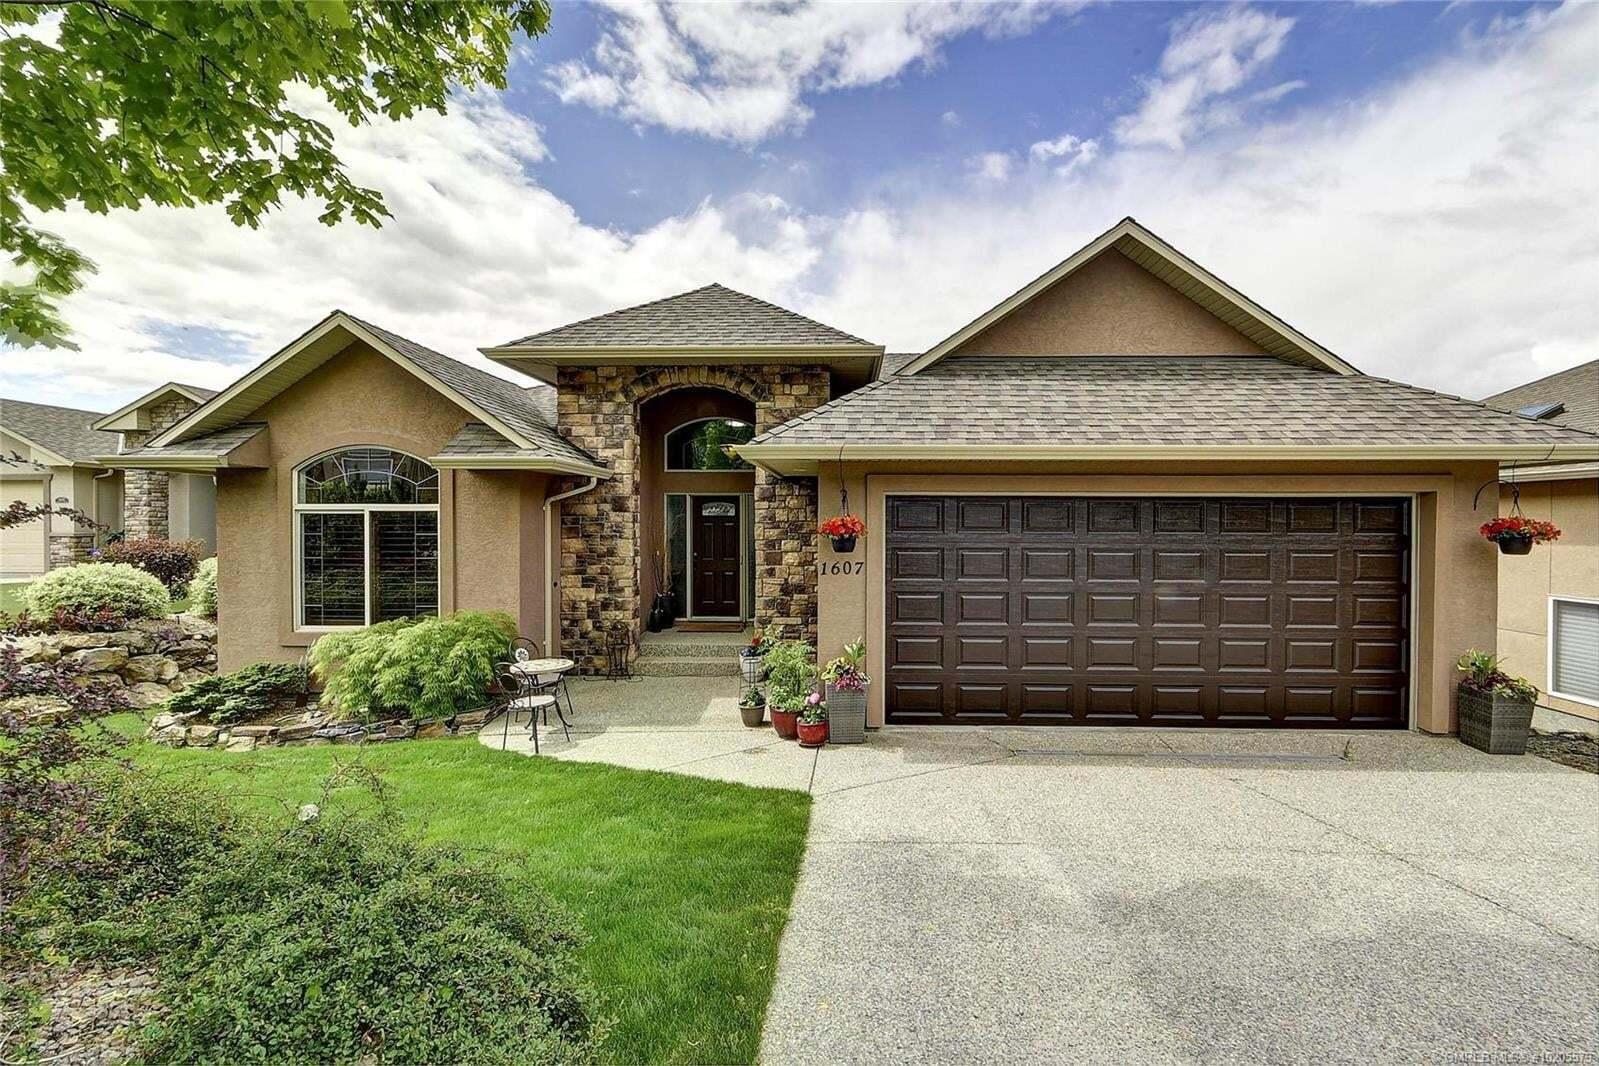 House for sale at 1607 Merlot Dr West Kelowna British Columbia - MLS: 10205579